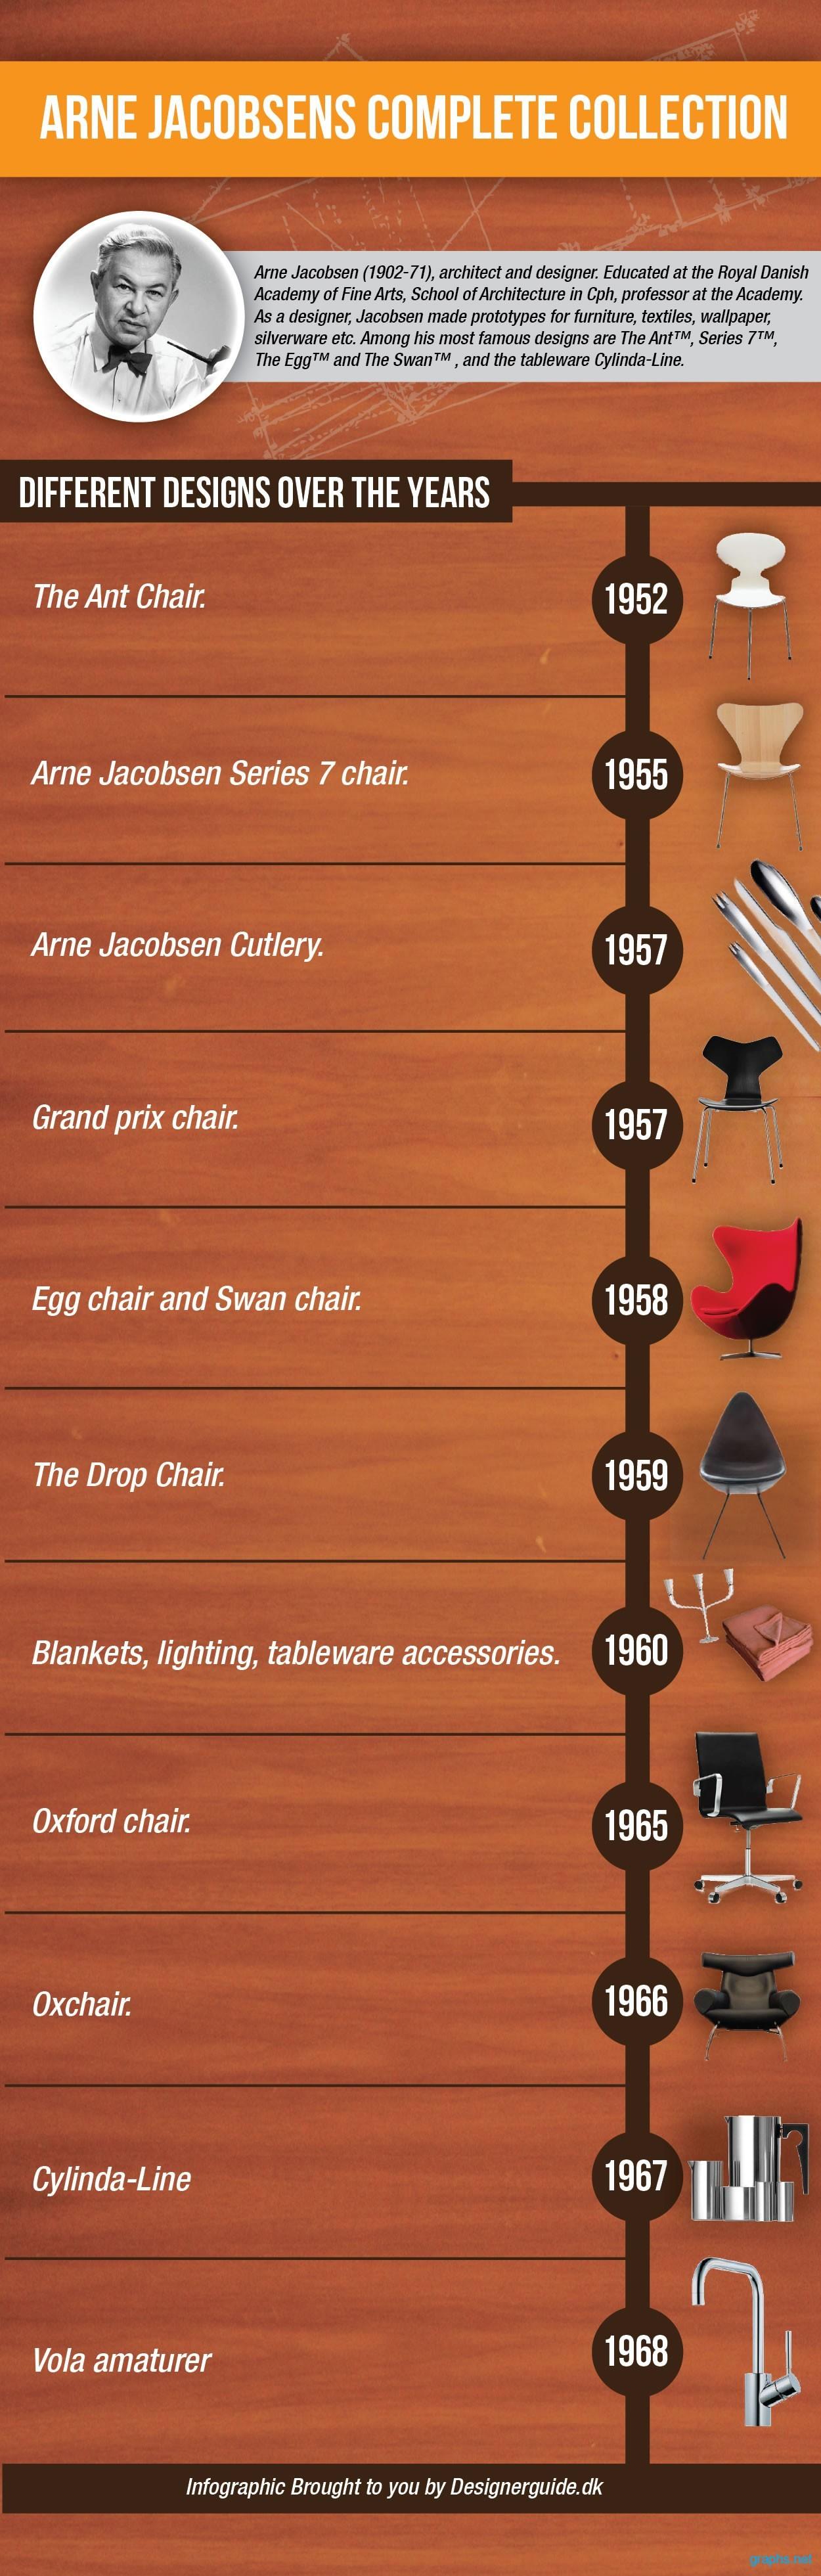 arne jacobsen chair designs